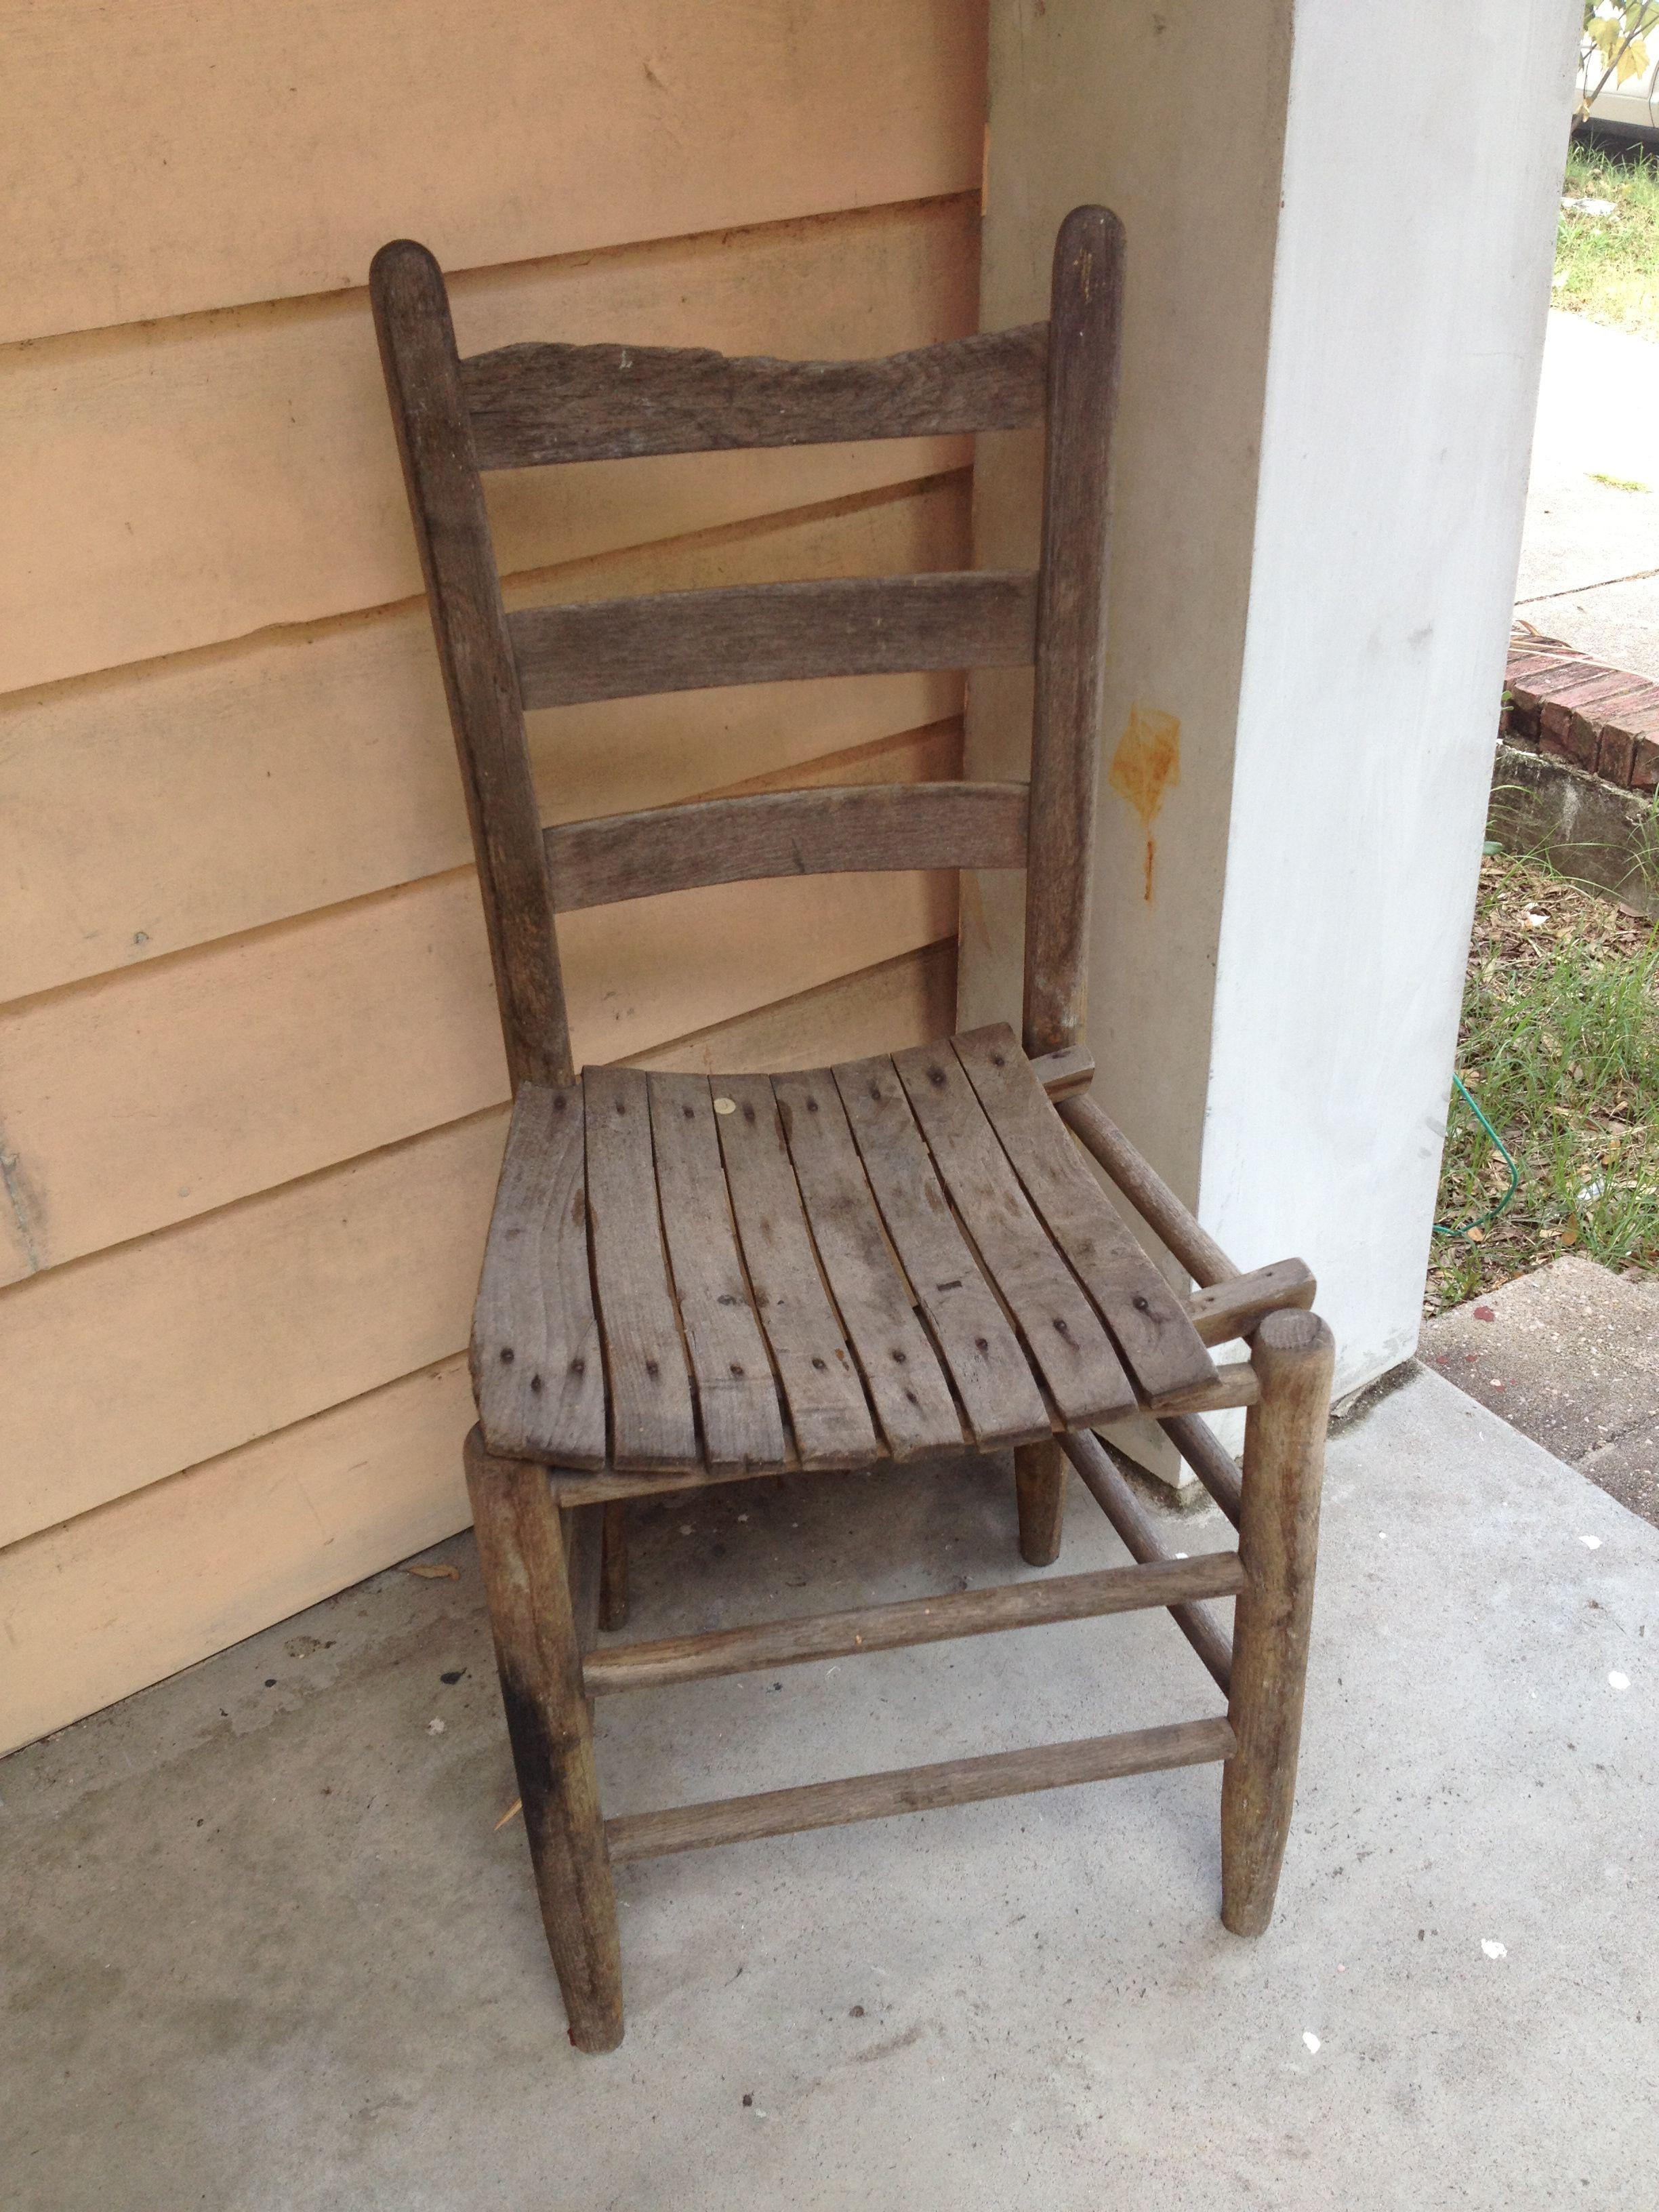 Vintage Wooden Chairs >> Vintage Wooden Chairs Google Search Vintage Wooden Chairs For